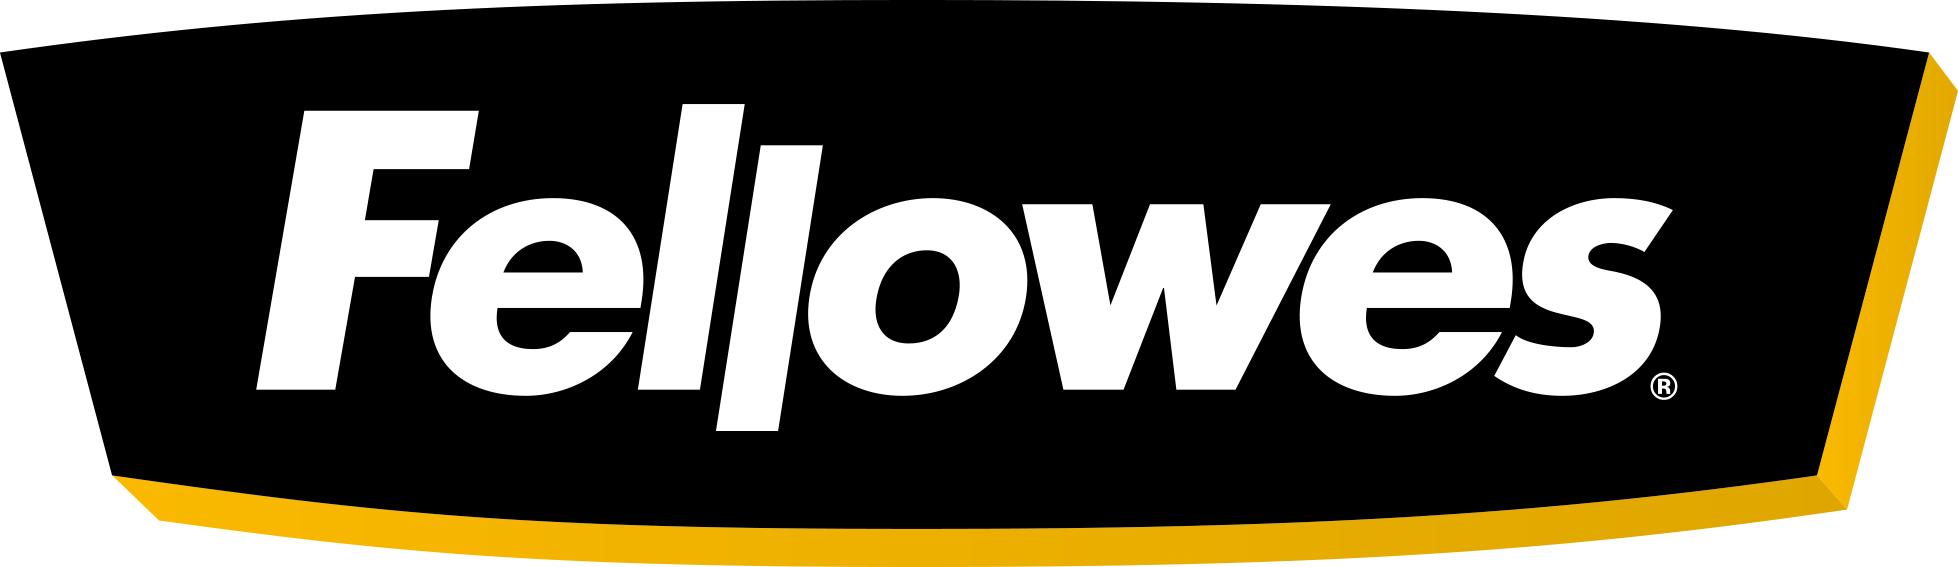 Distruggi documenti Fellowes